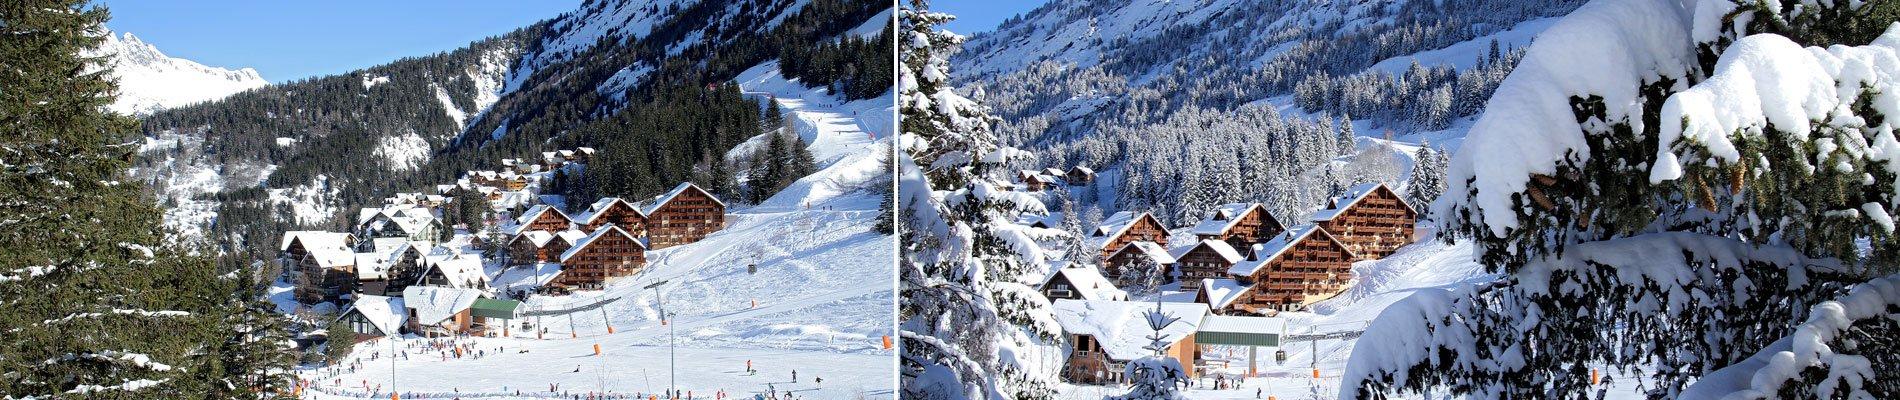 chalet-des-neiges-oz-en-oisans-alpe-d-huez-wintersport